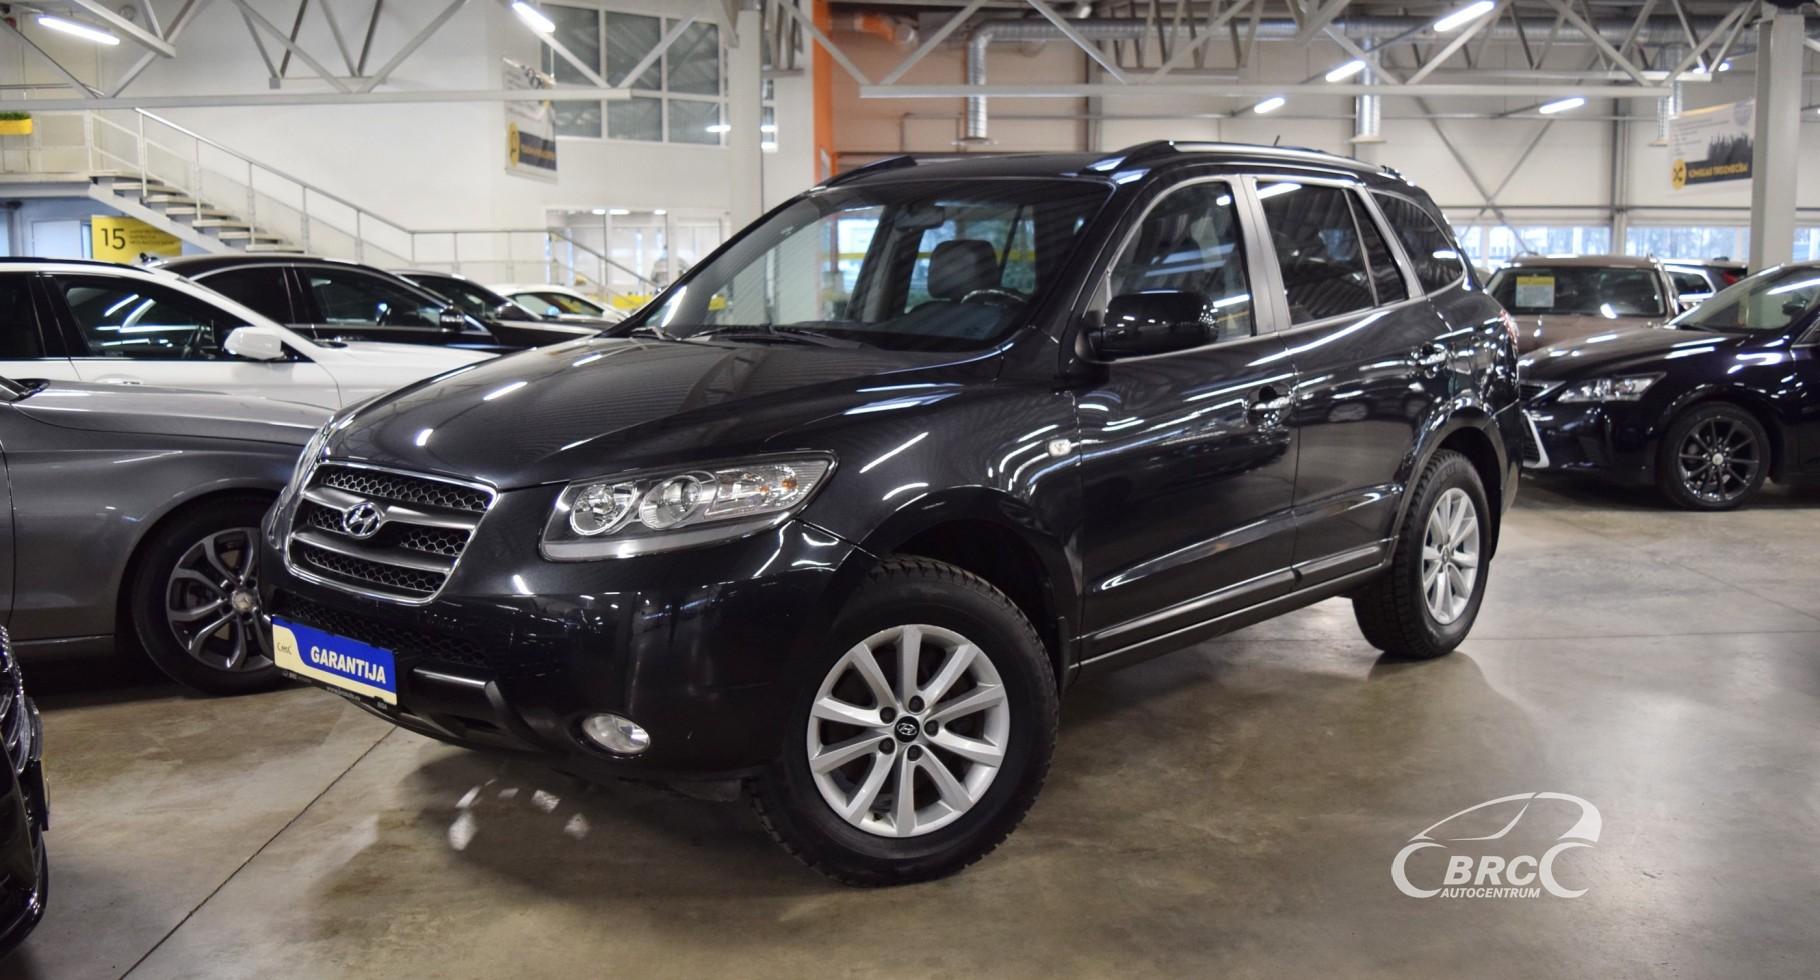 Hyundai Santa Fe CRDI